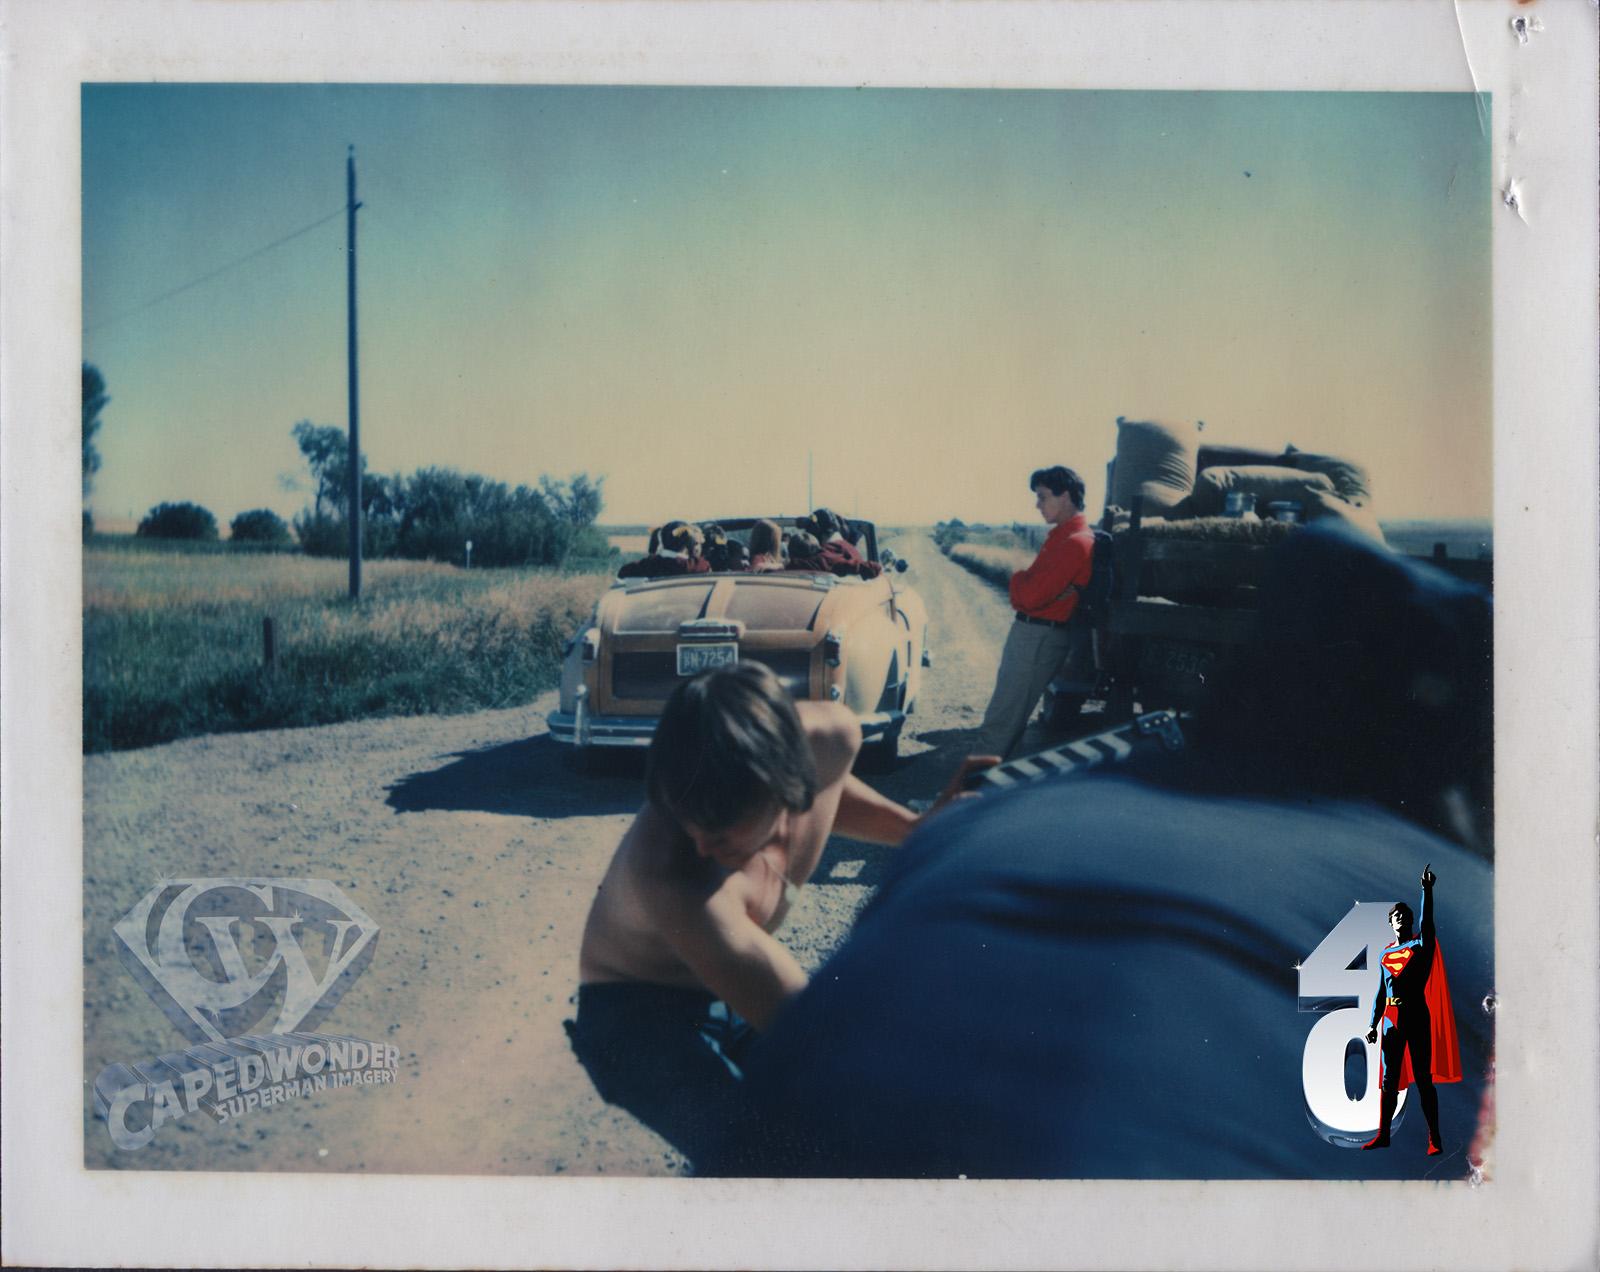 CW-STM-clark-leans-on-truck-smallville-polaroid-2